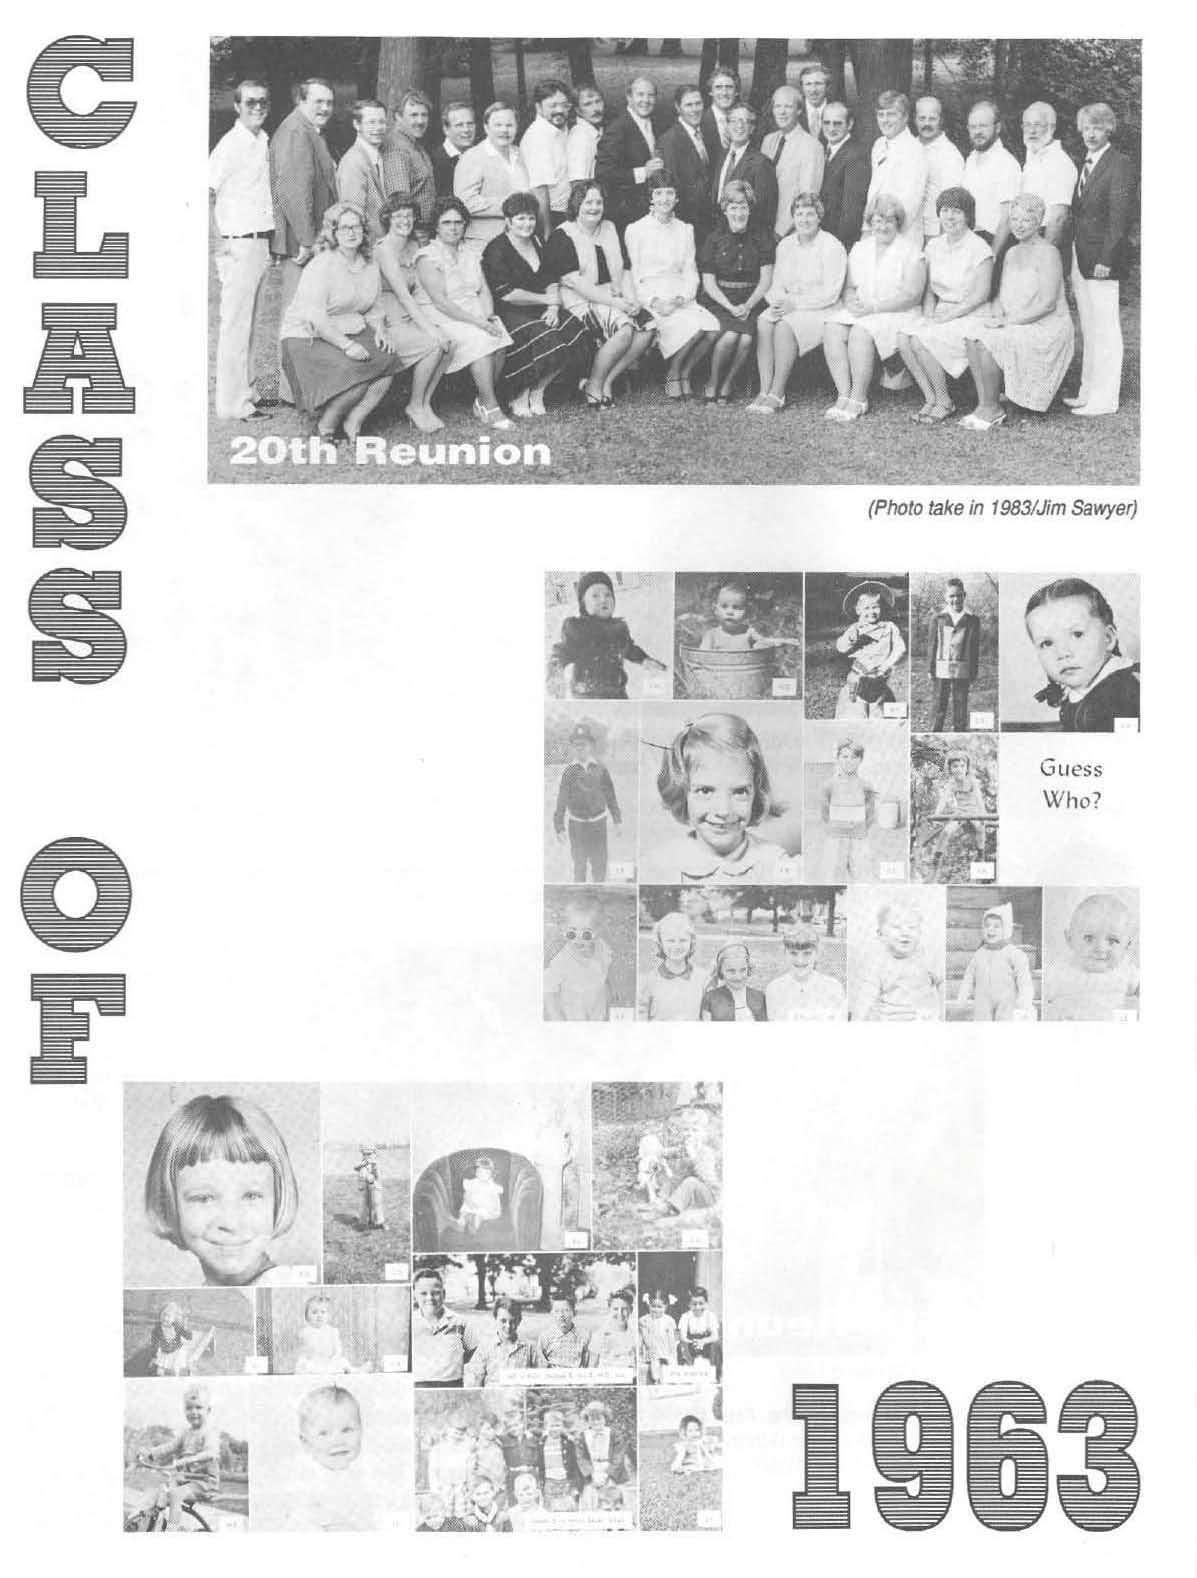 1993 1963